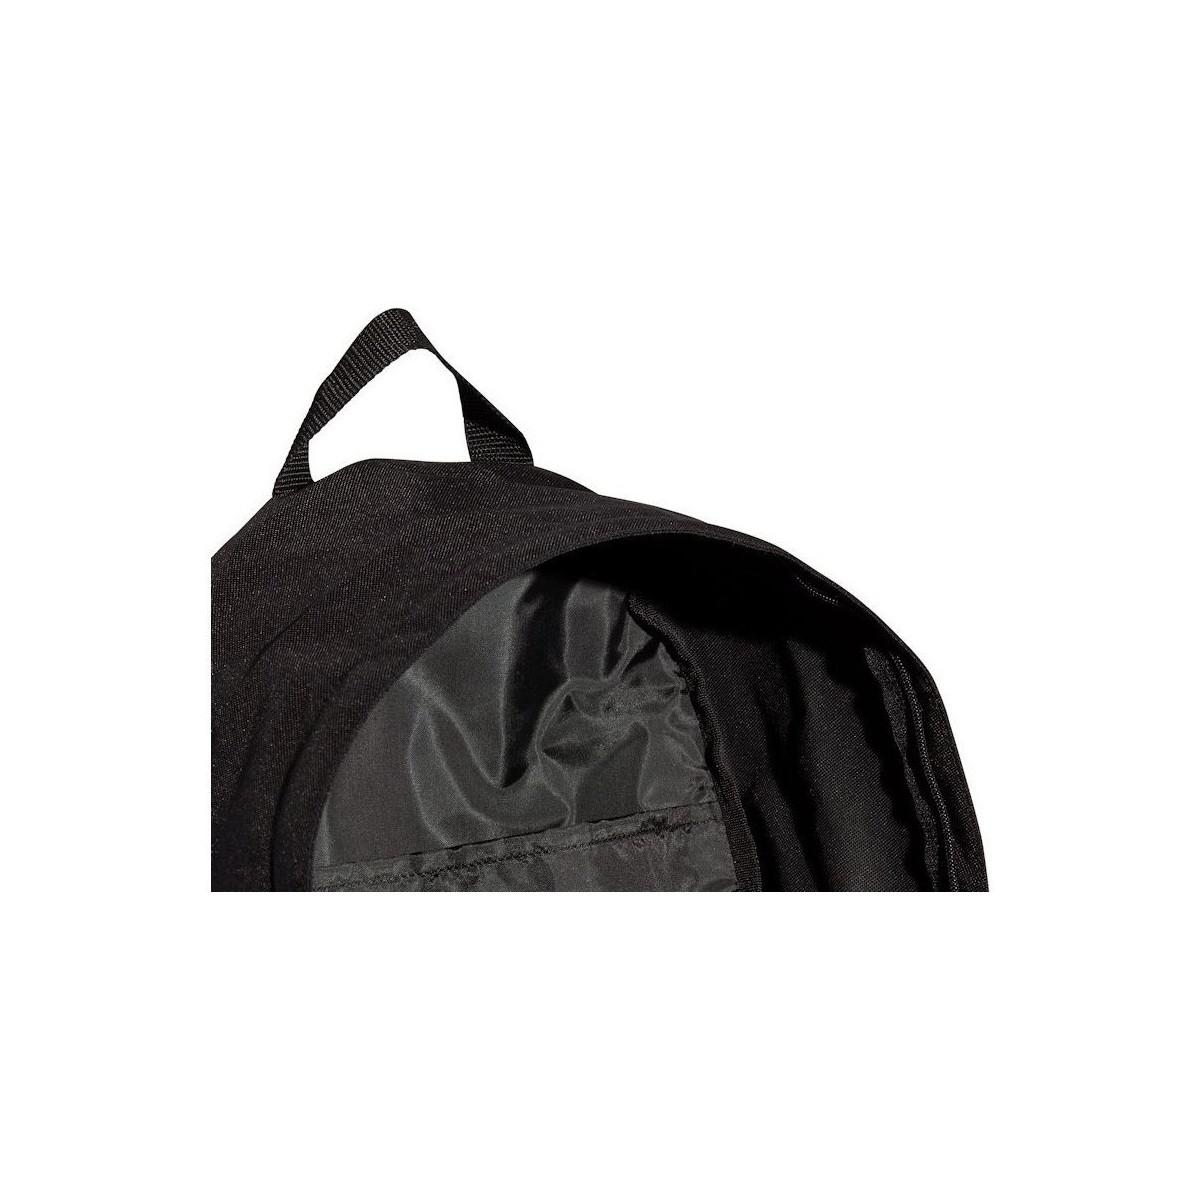 f698d81bd95 Adidas Class Bp Men s Backpack In Black in Black for Men - Lyst